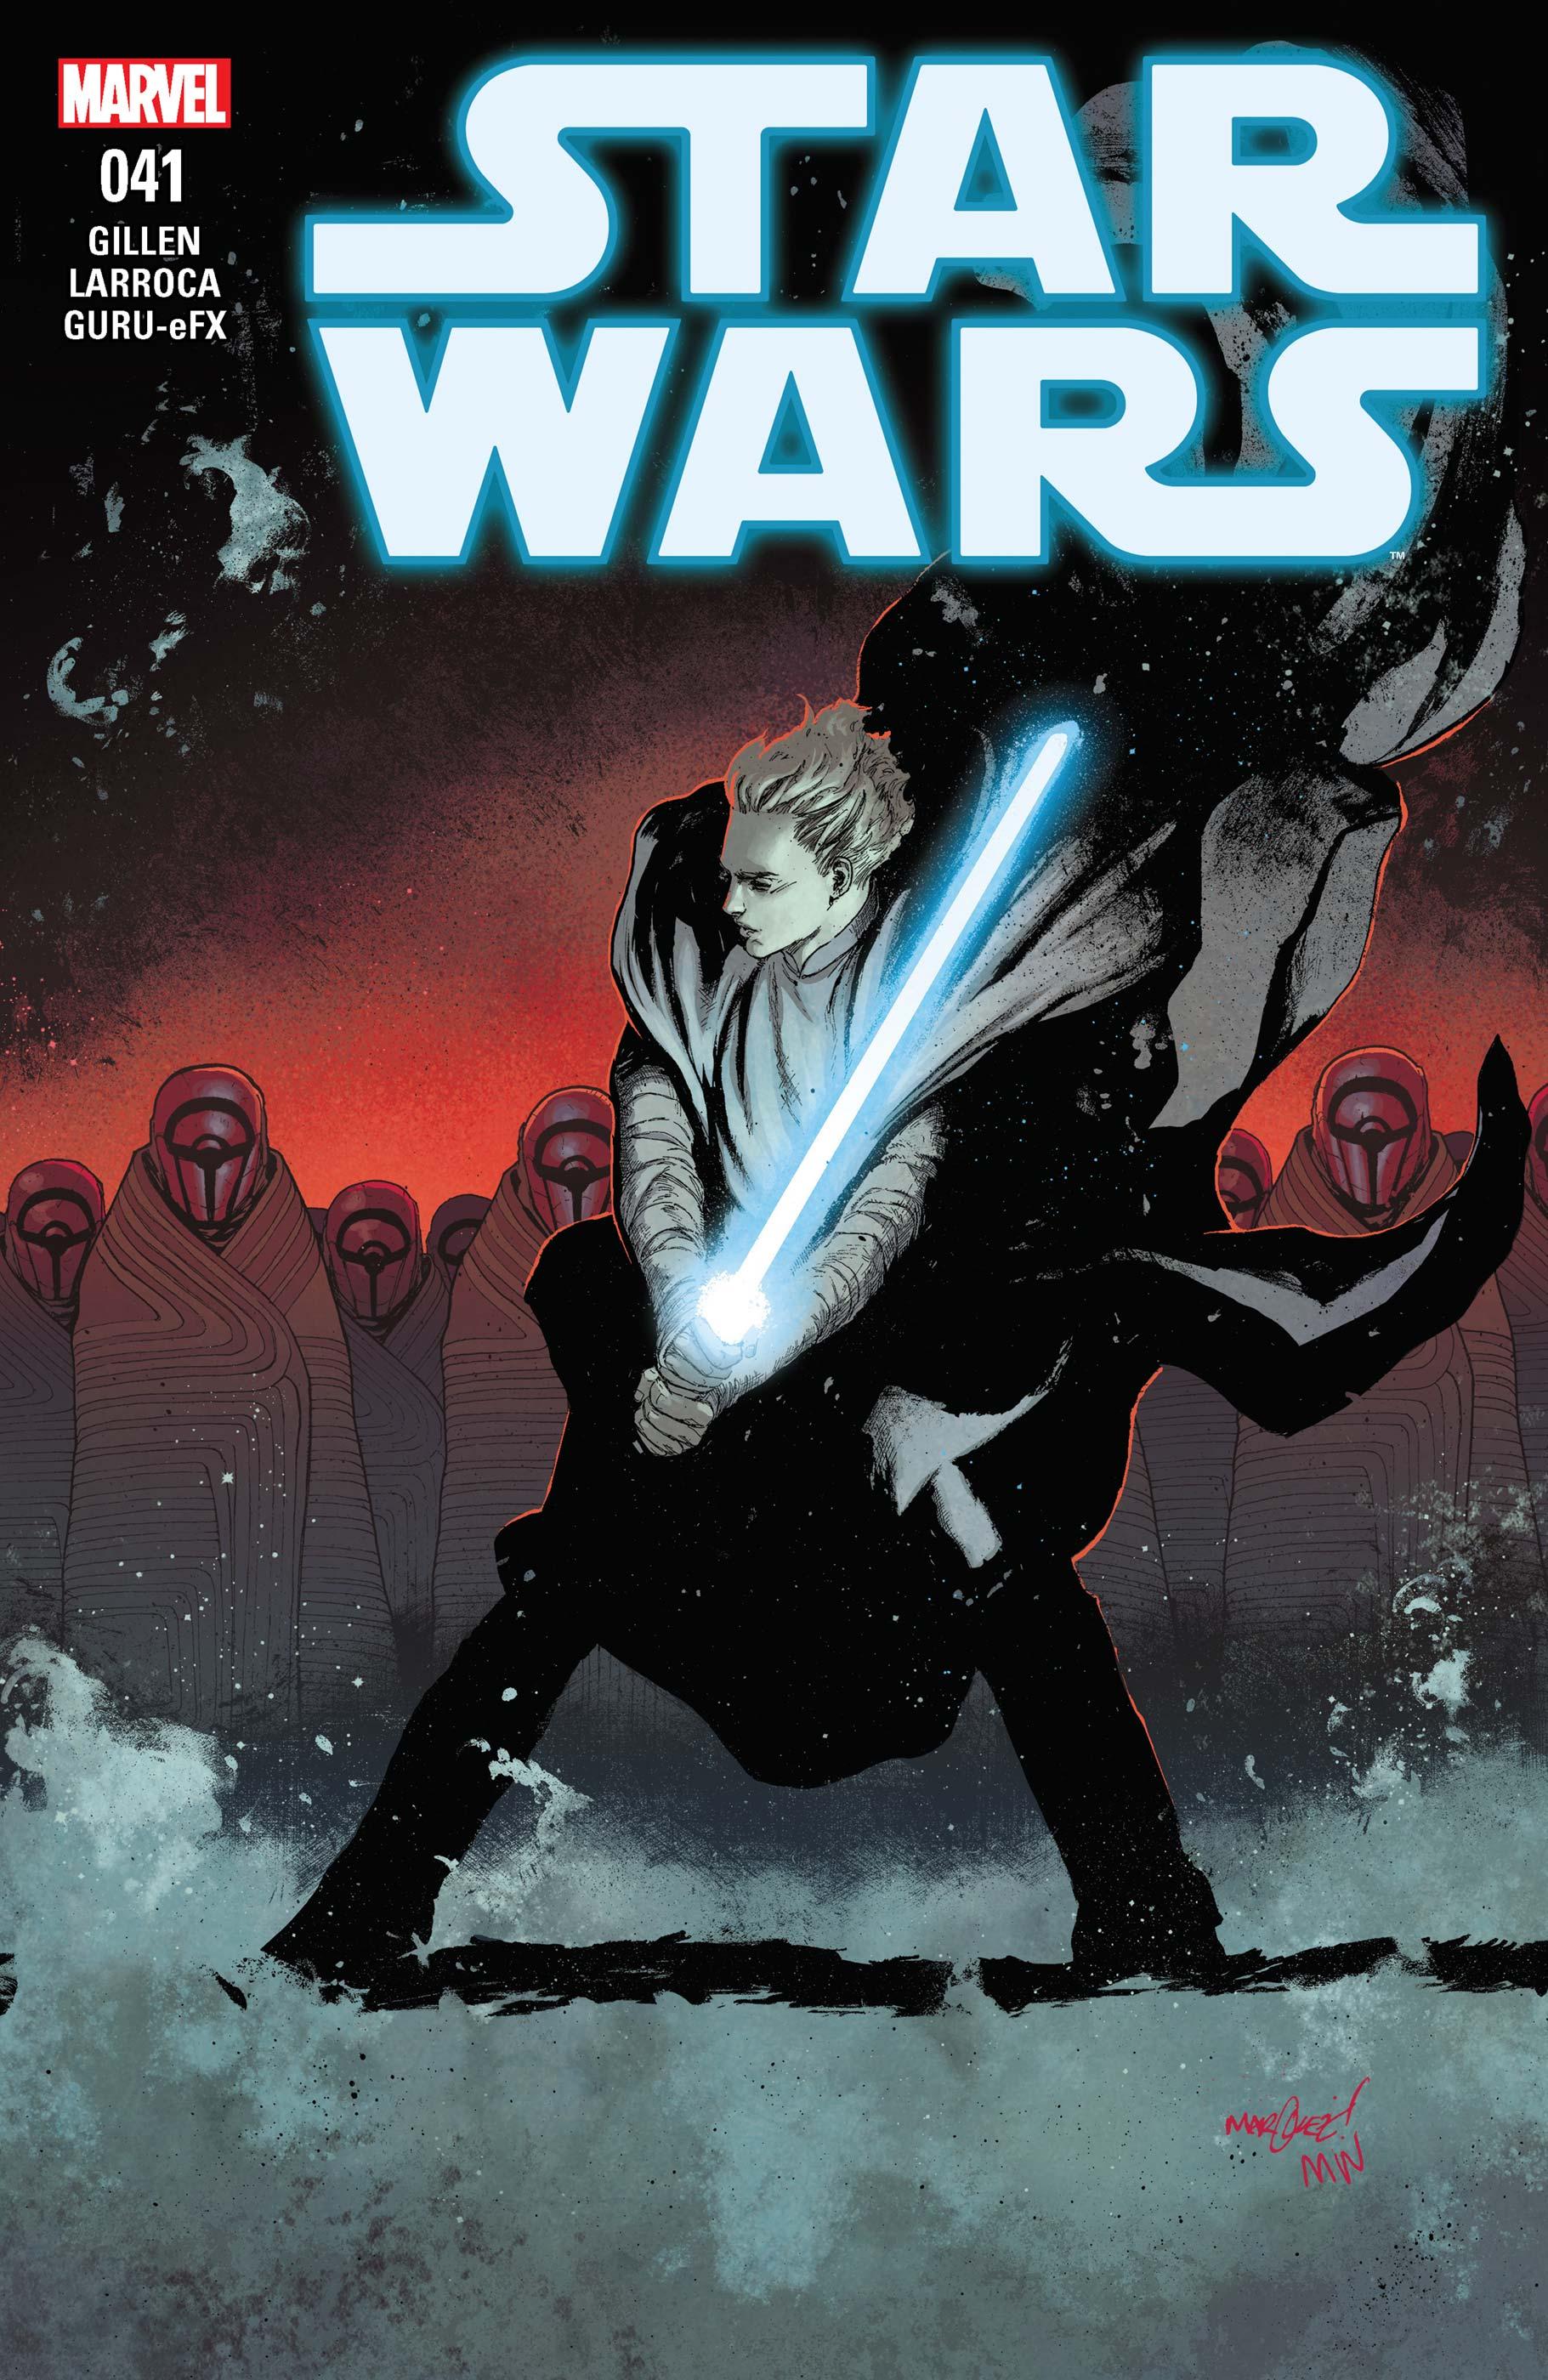 Star Wars (2015) #41